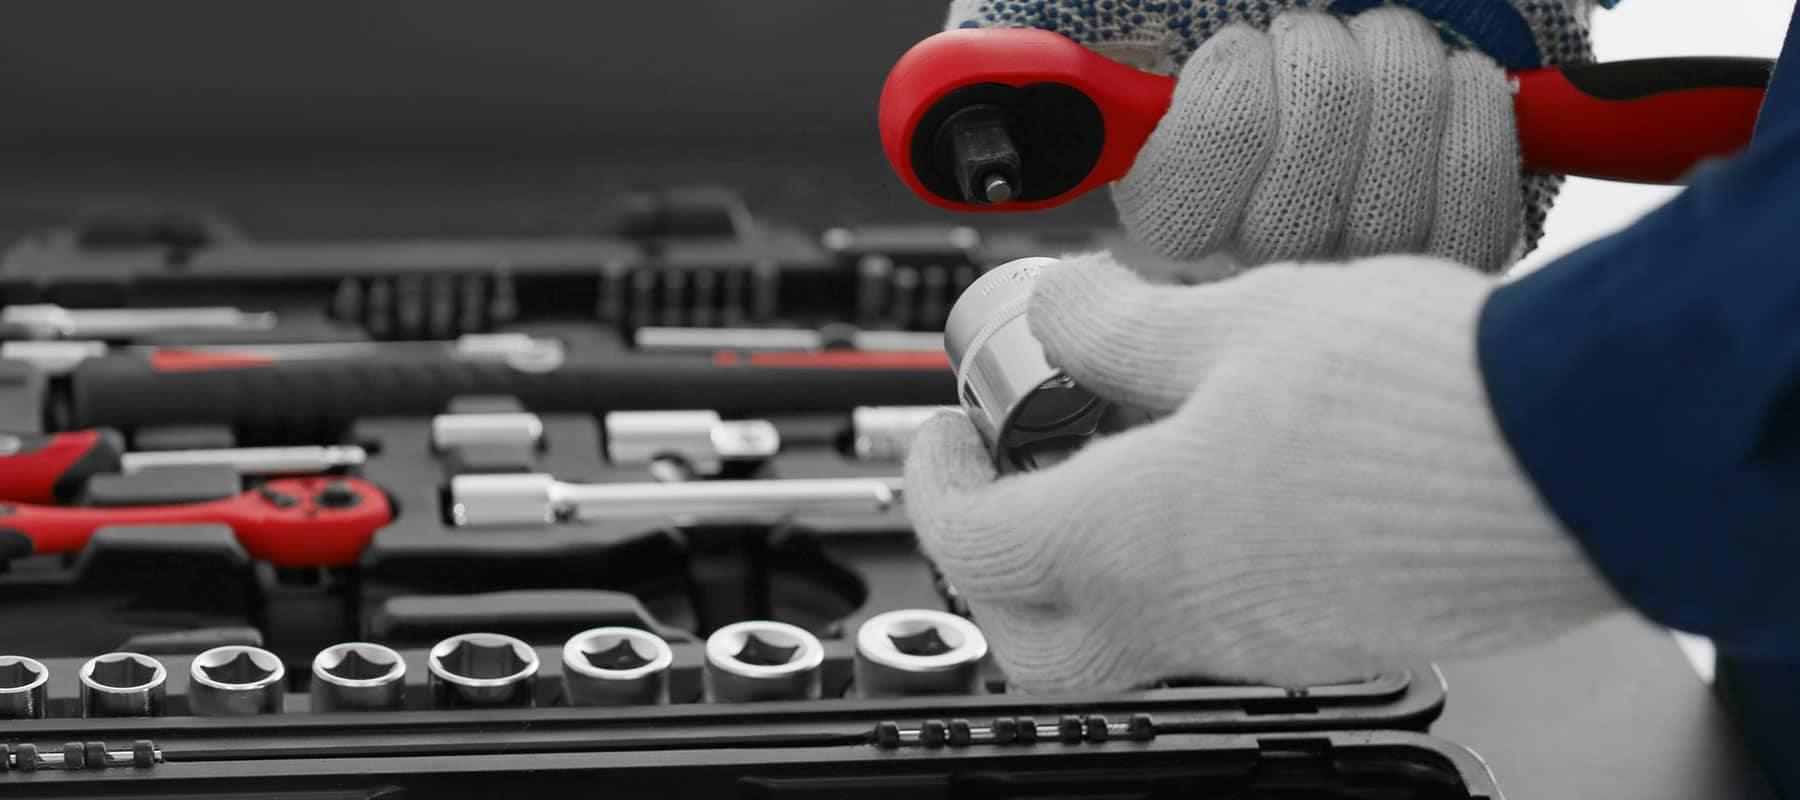 service technician preparing a tool